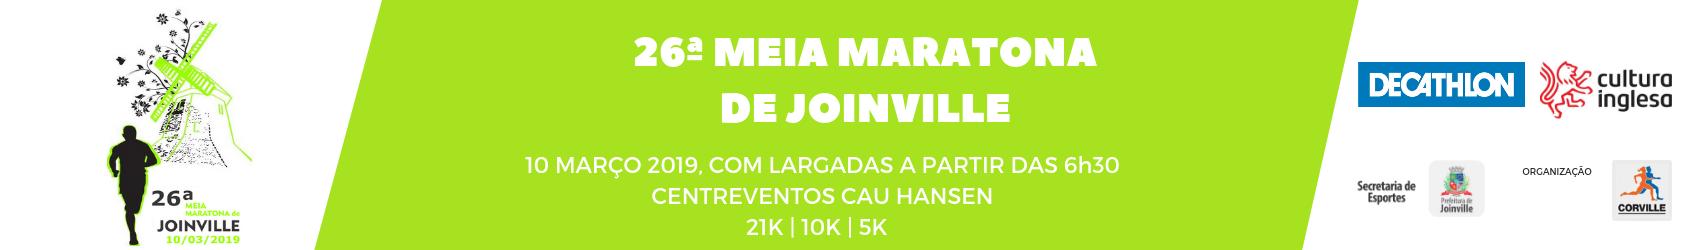 26ª MEIA MARATONA DE JOINVILLE - 2019